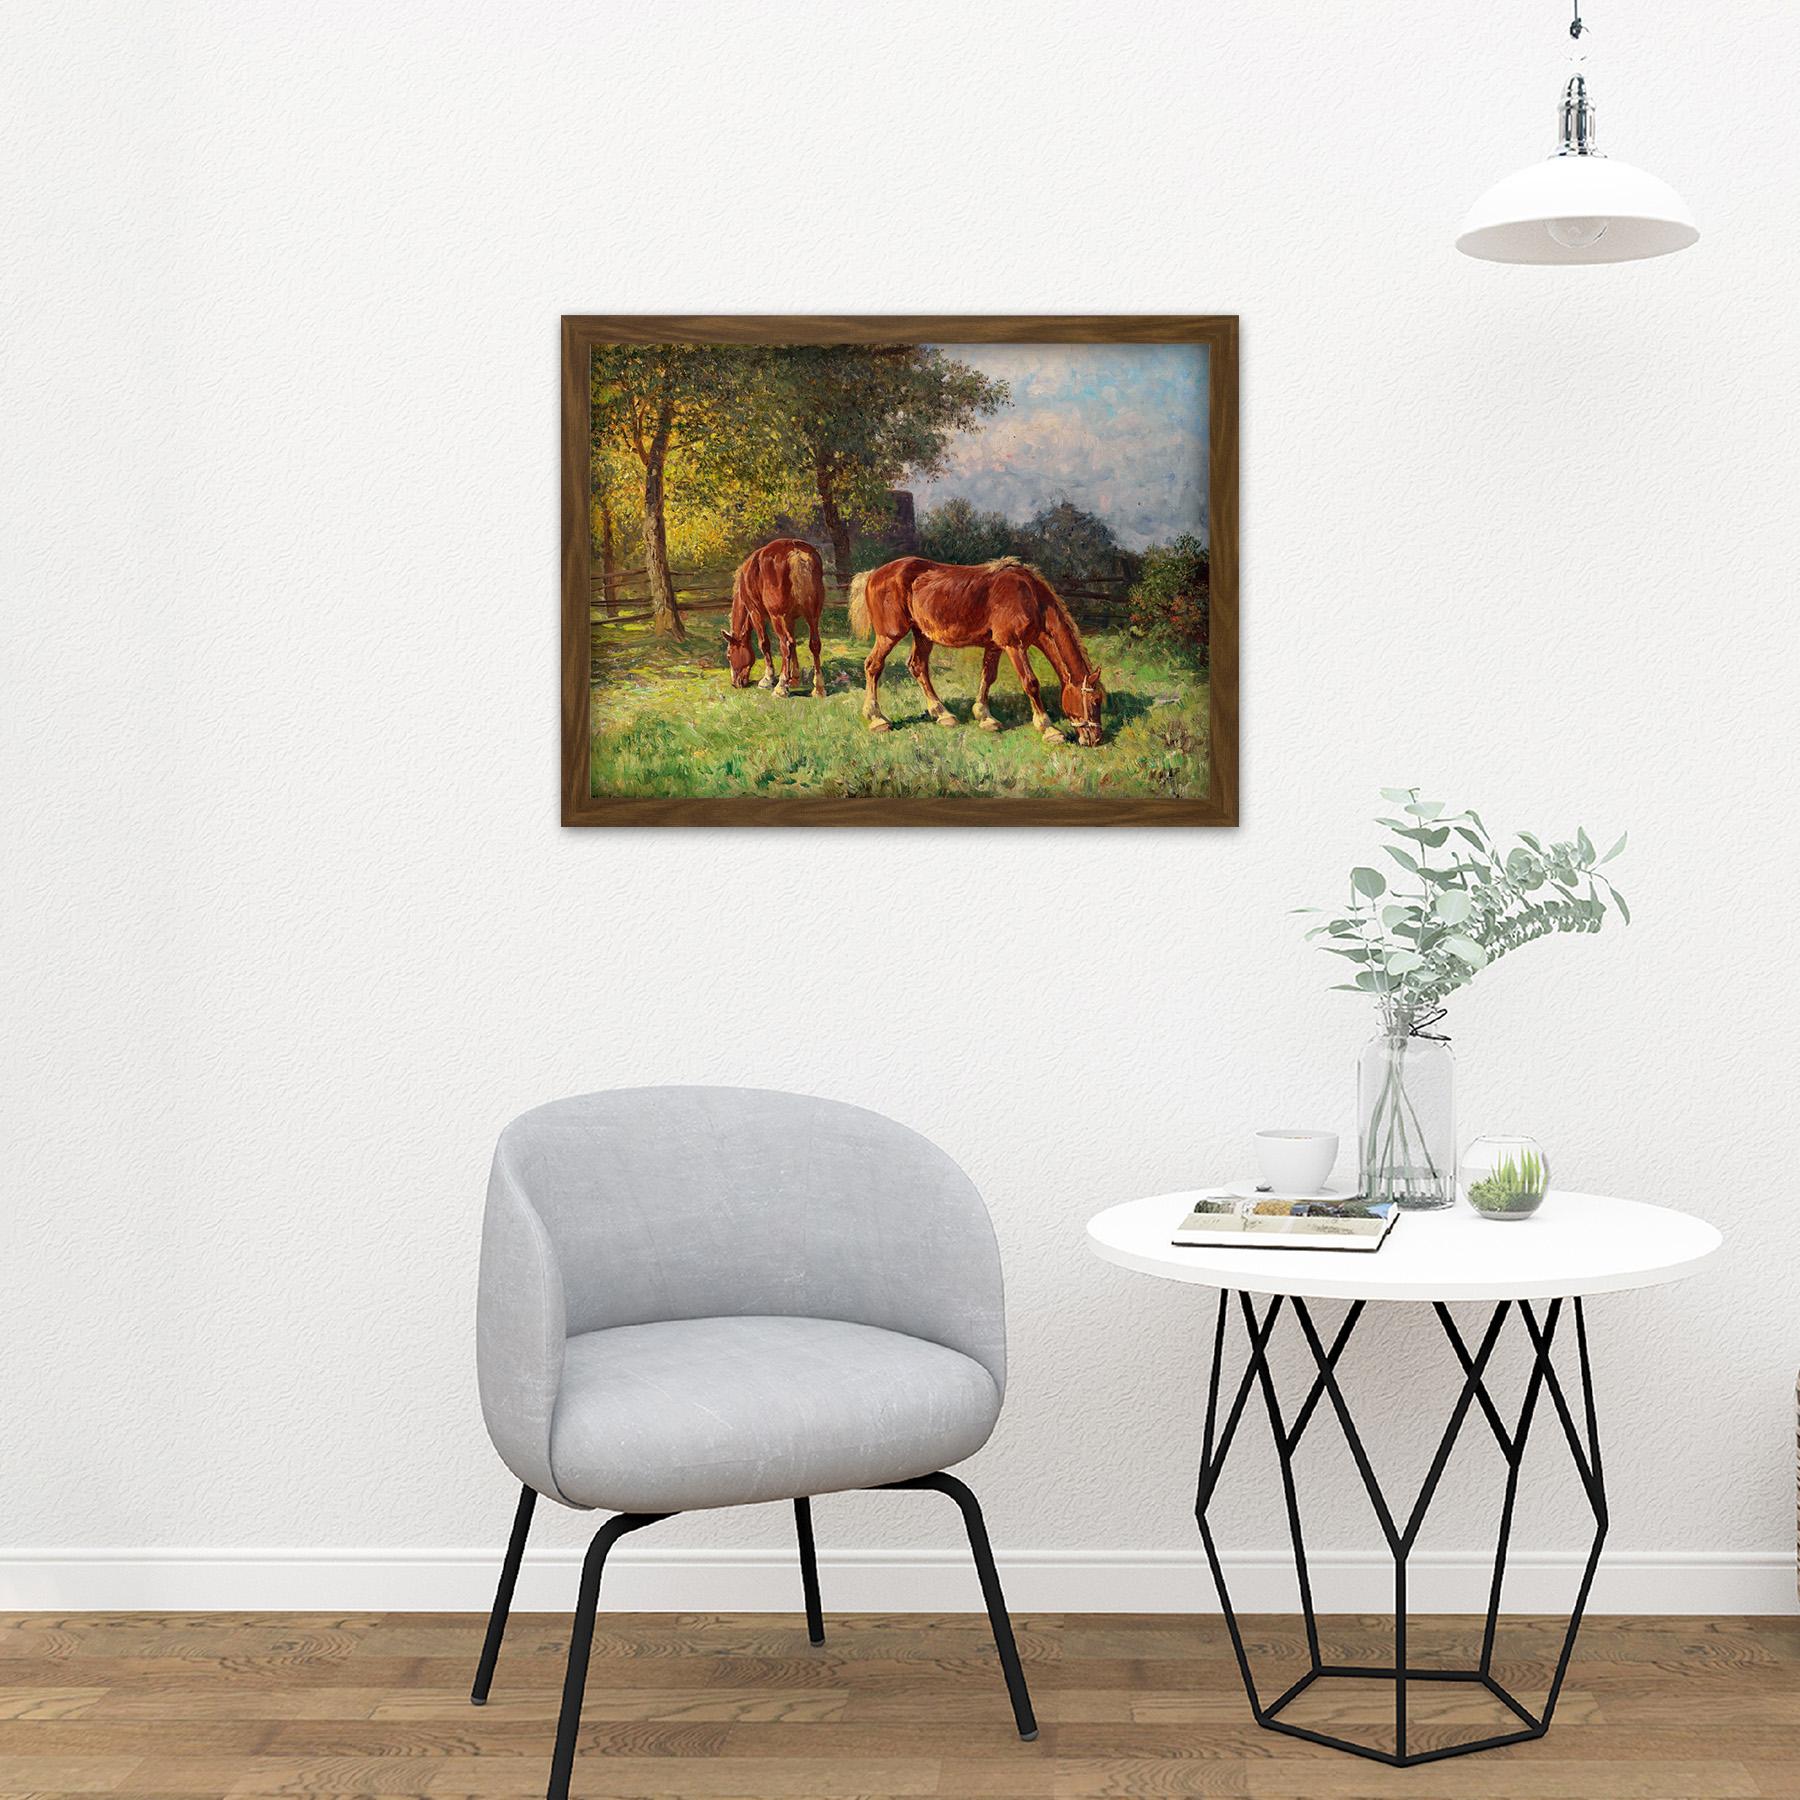 Van-Der-Venne-Horses-In-Pasture-Painting-Large-Framed-Art-Print thumbnail 13